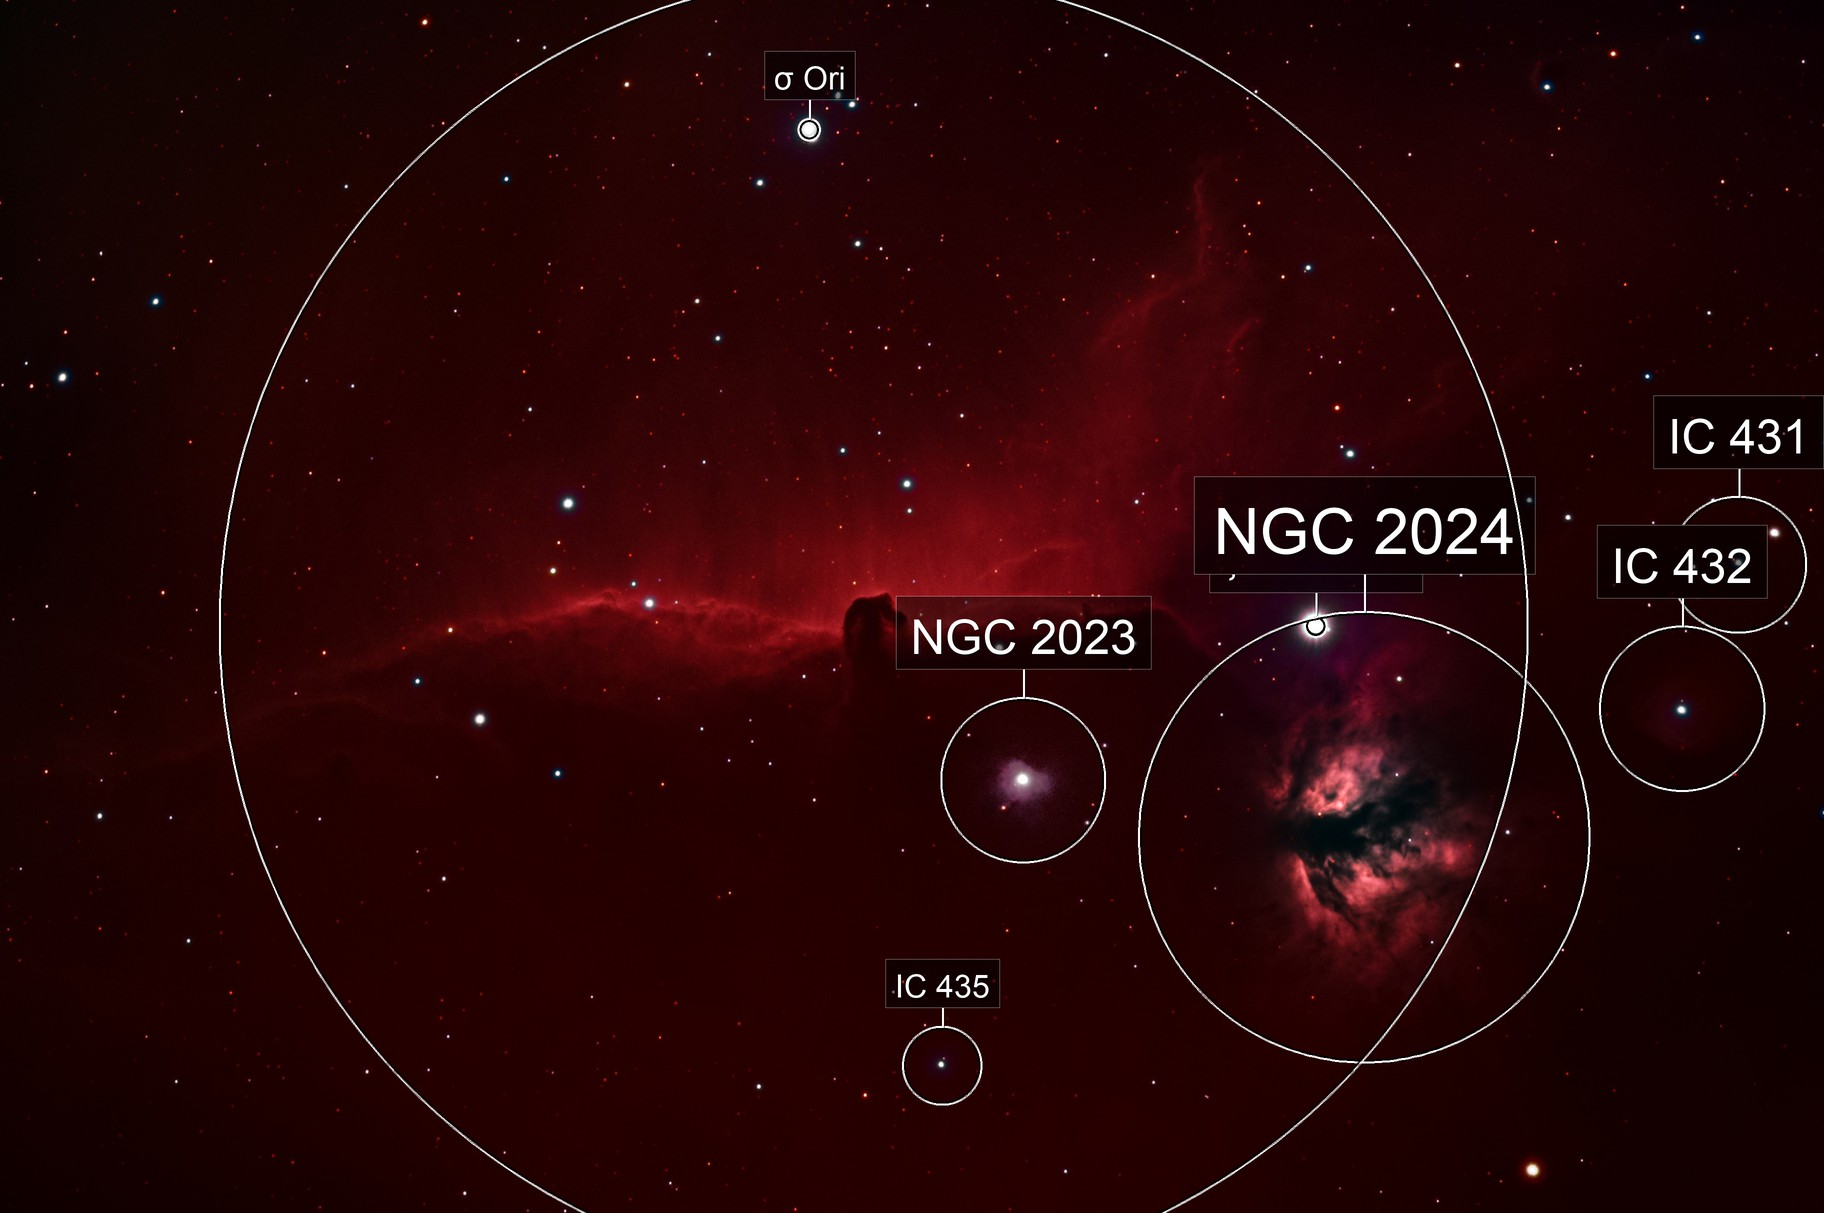 IC434 - Horsehead Nebula and Flame Nebula (NGC 2024)